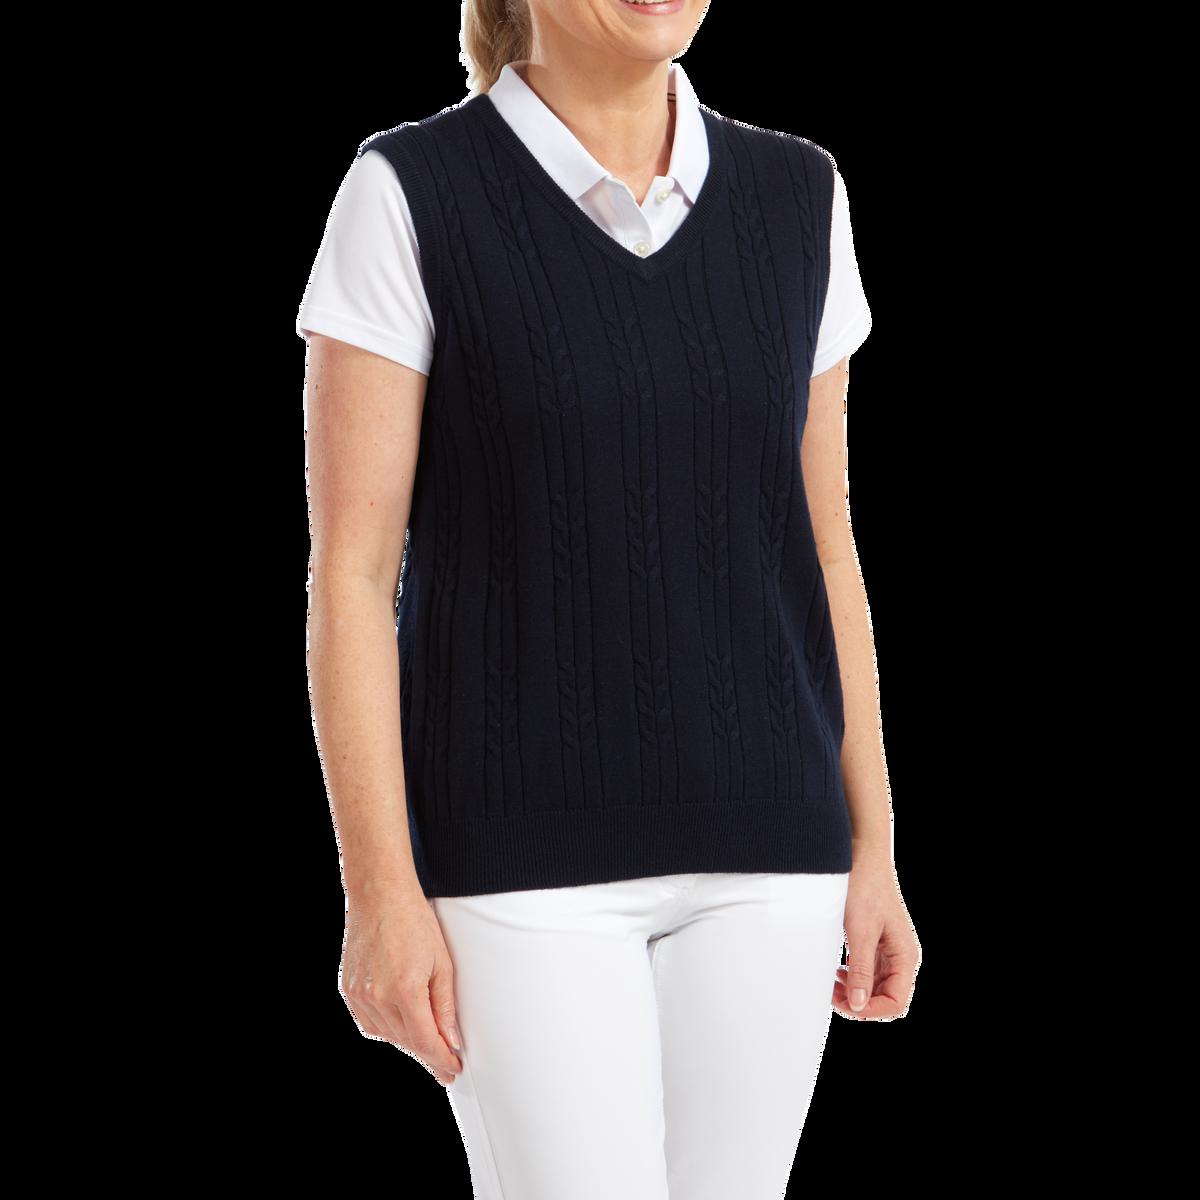 Women's Wool Blend Cable Knit V-Neck Vest